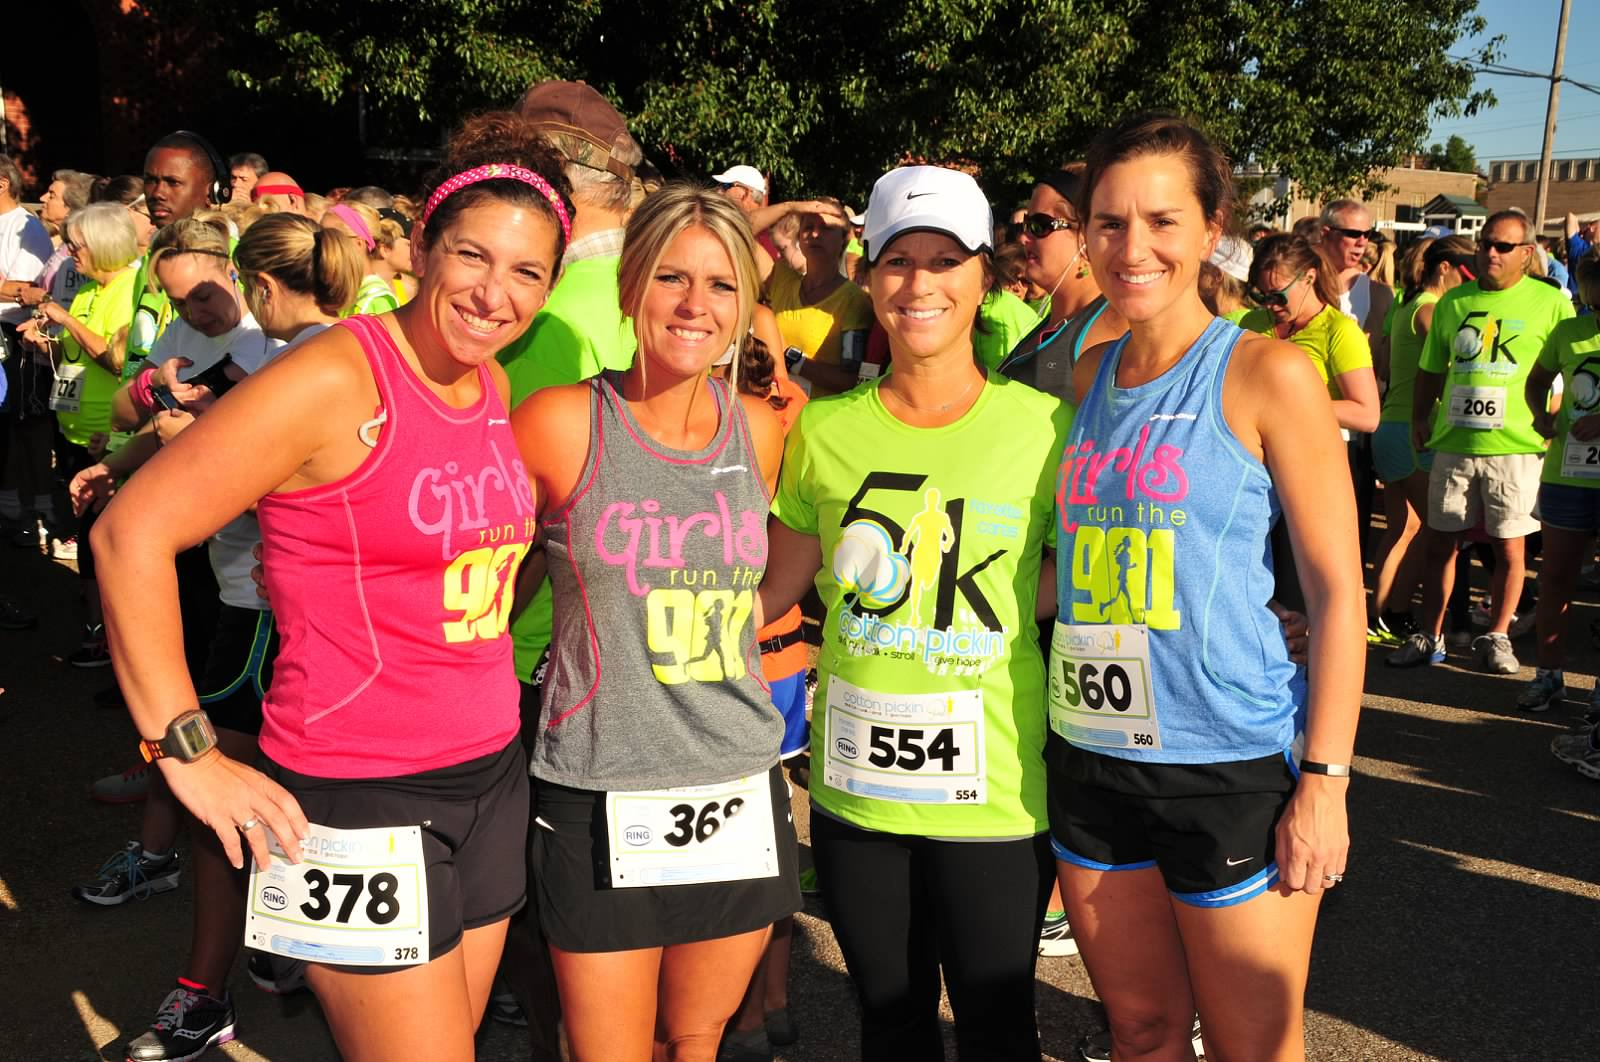 2013-Cotton-Pickin-5k-Girls-Run-the-901-runners